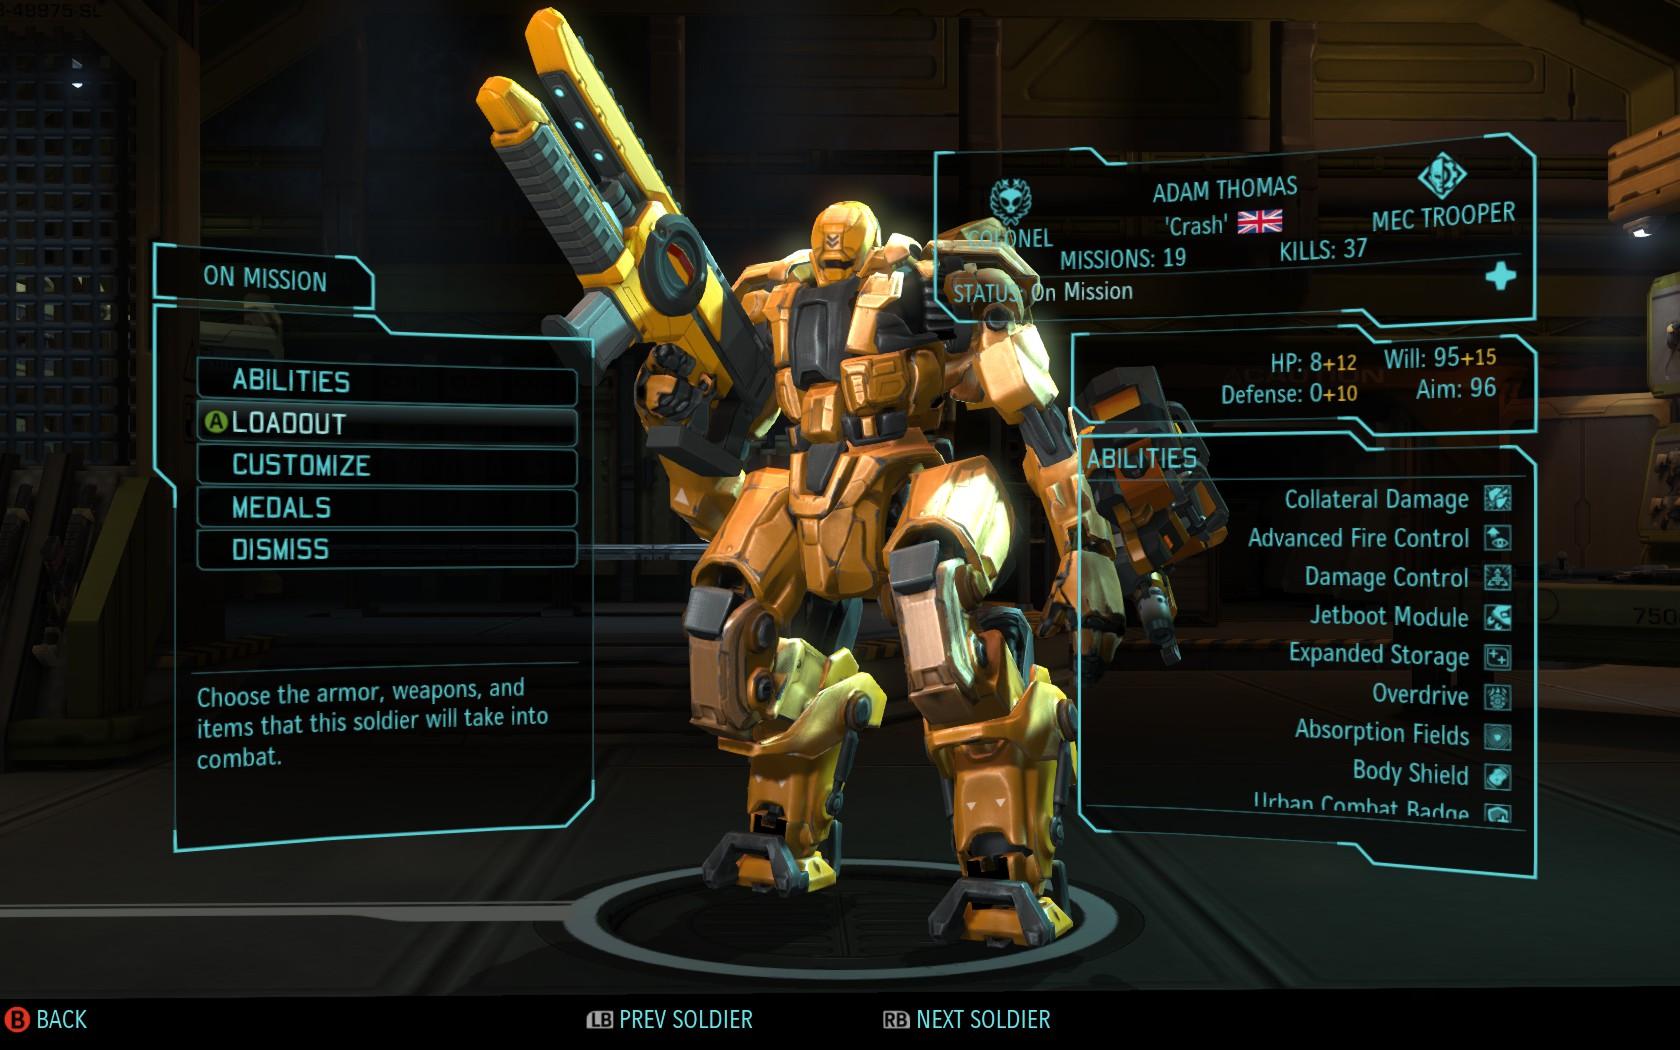 Steam Community Screenshot MEC Trooper Crash